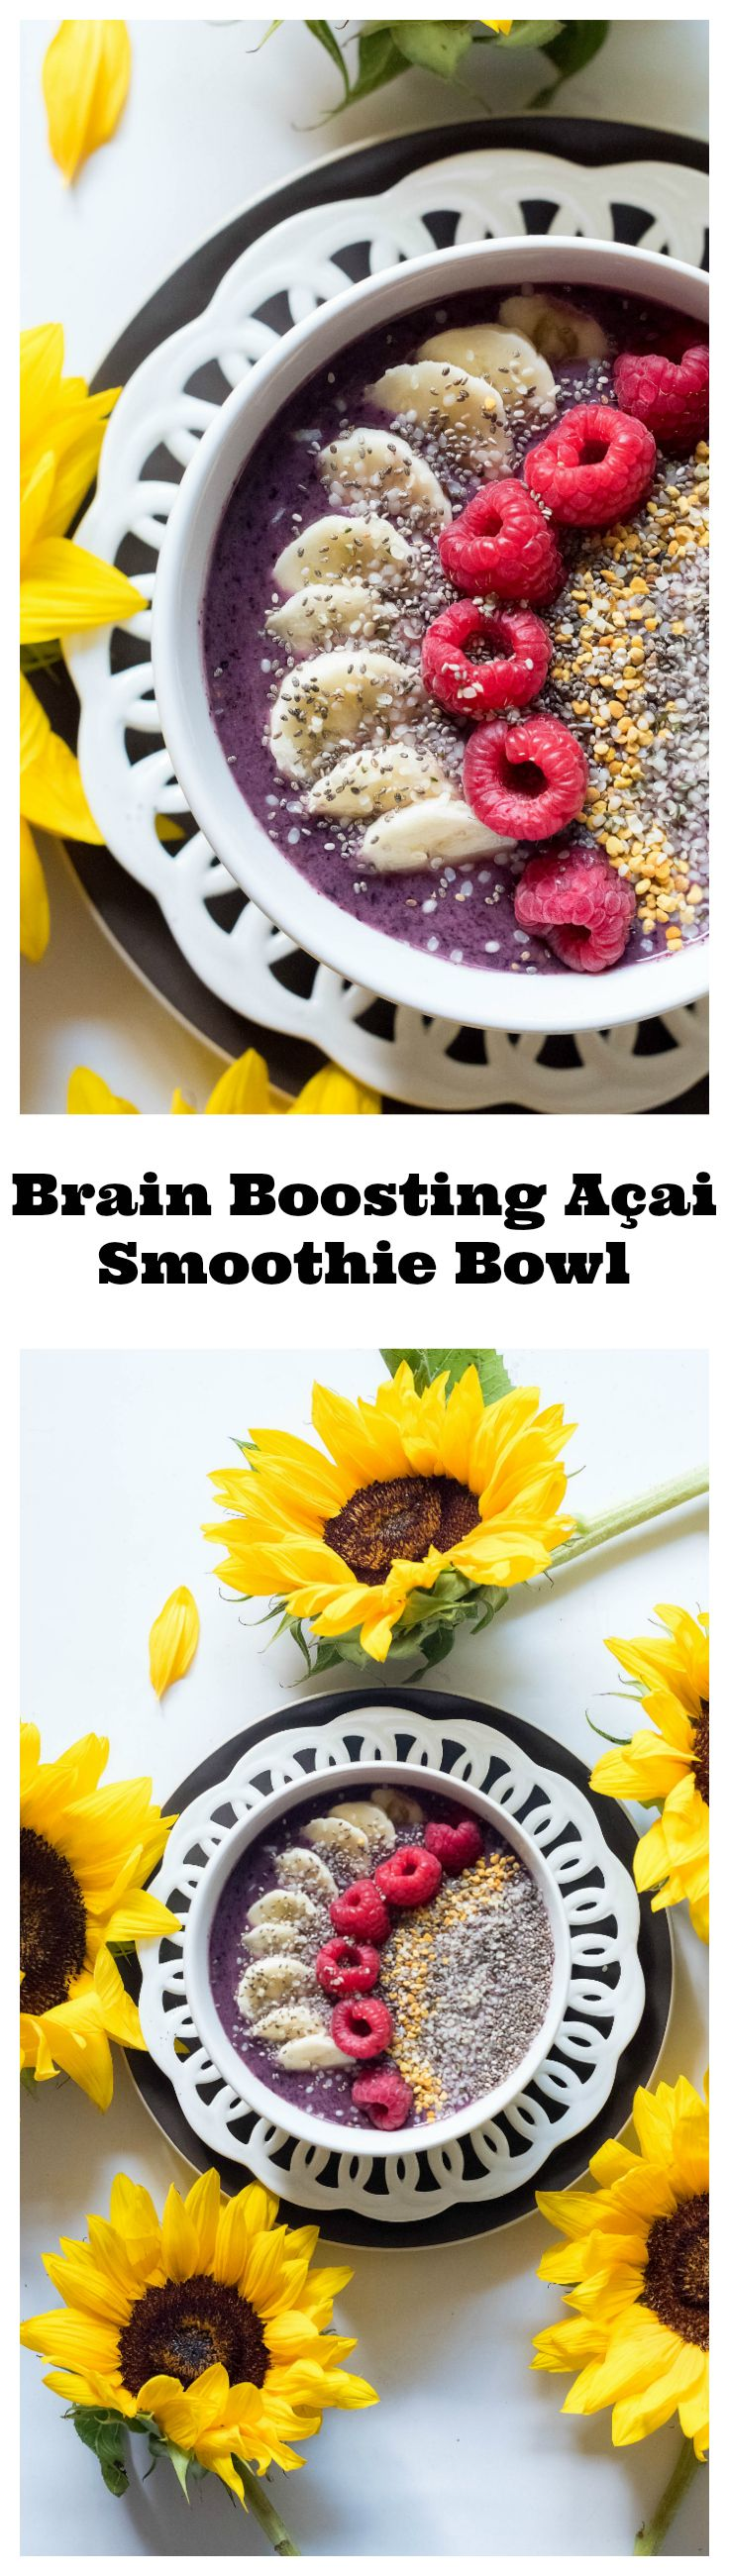 Brain Boosting Açai Smoothie Bowl Recipe